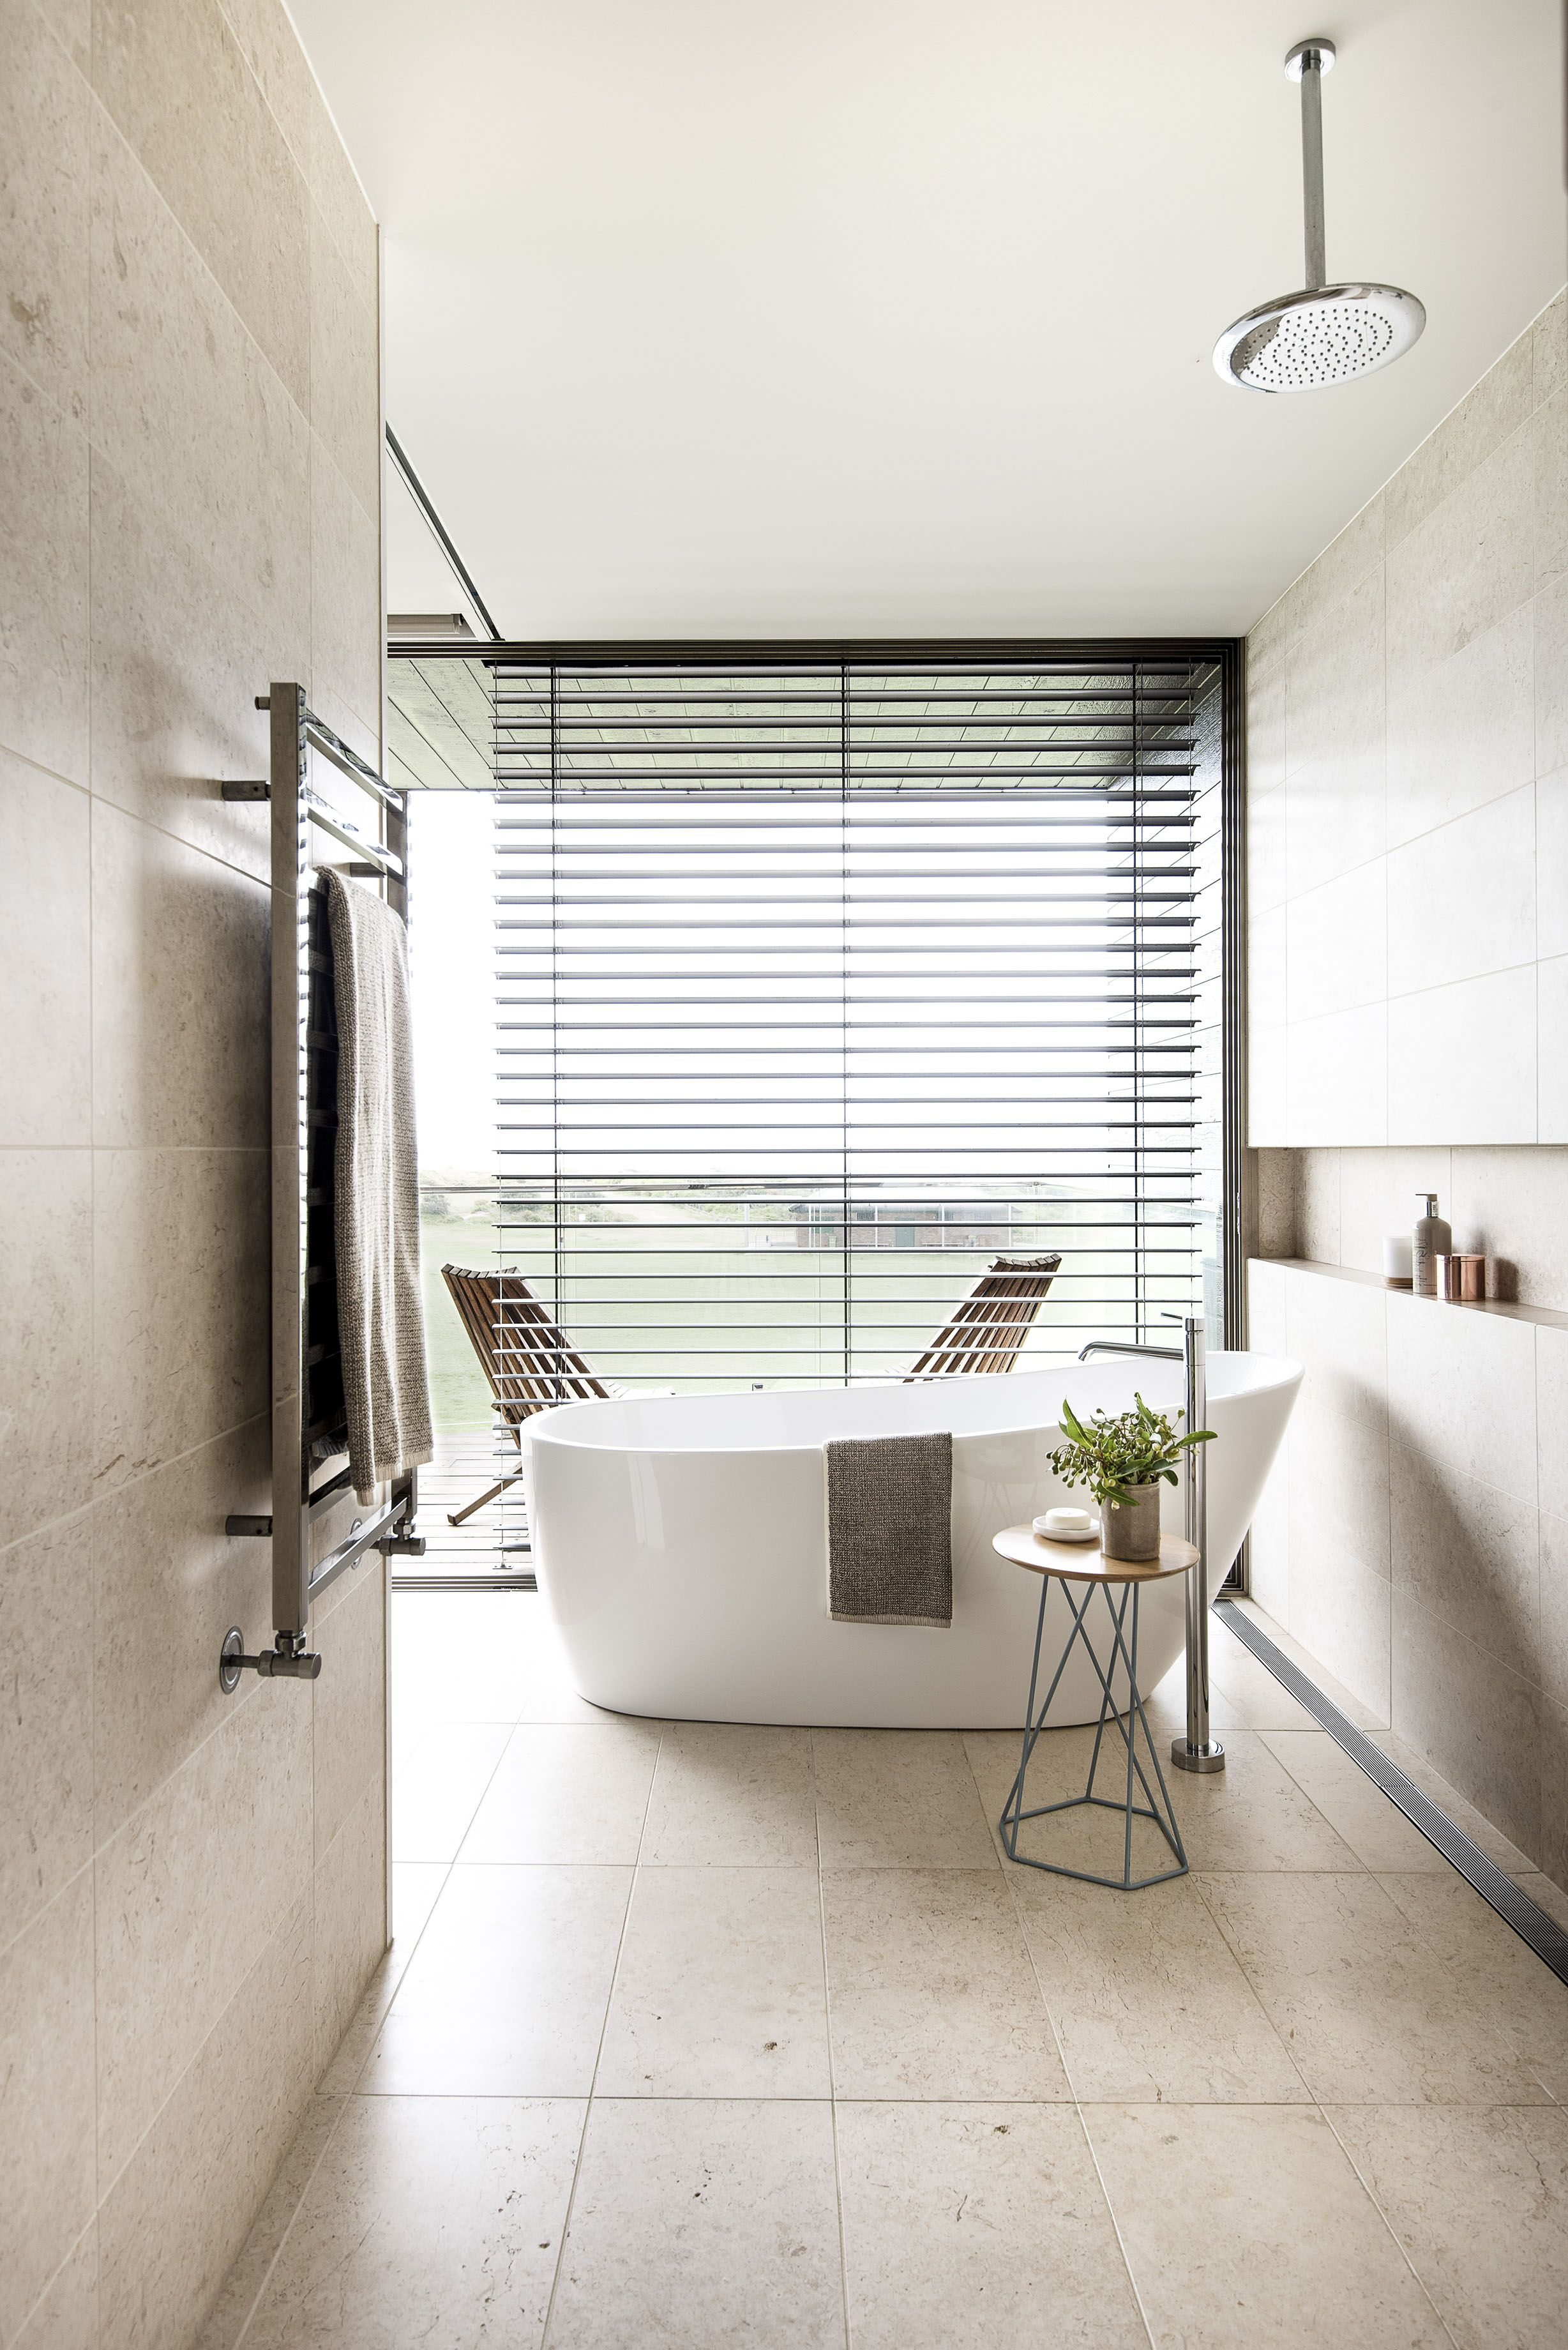 Ensuite badroom | Sherree\'s bathroom ideas | Pinterest | House ...